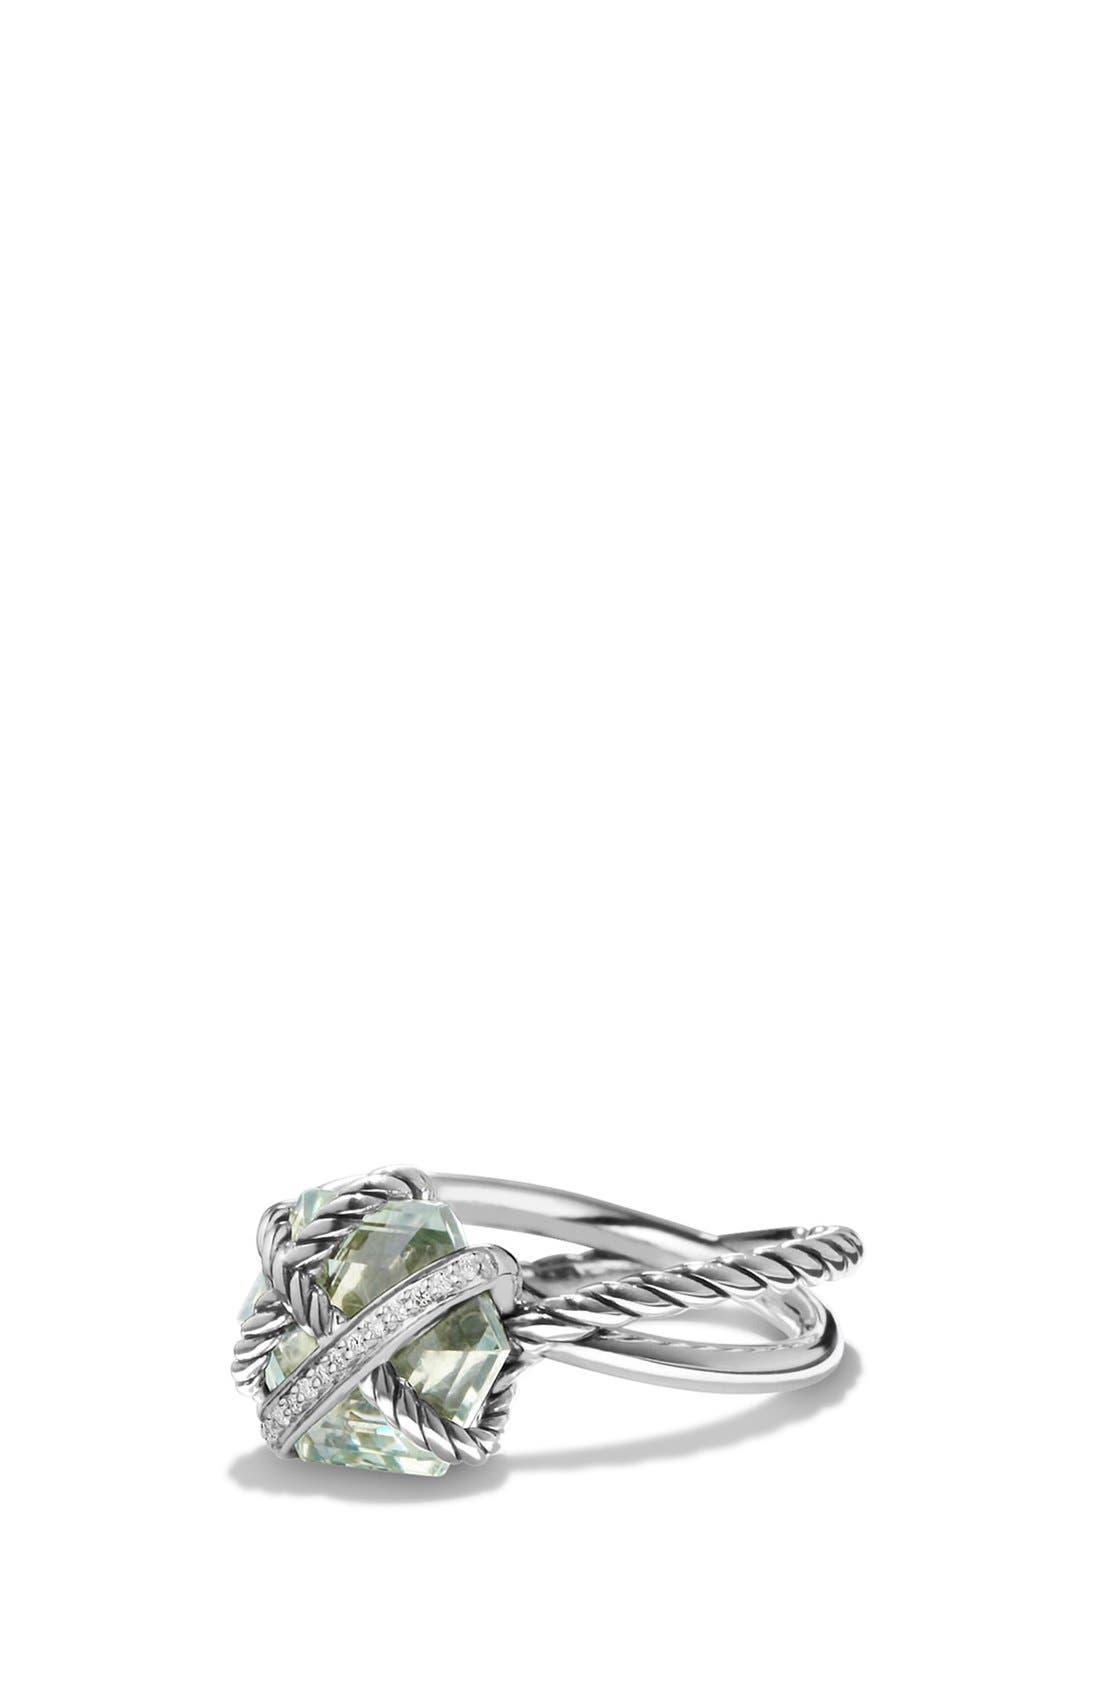 DAVID YURMAN Cable Wrap Ring with Semiprecious Stone andDiamonds